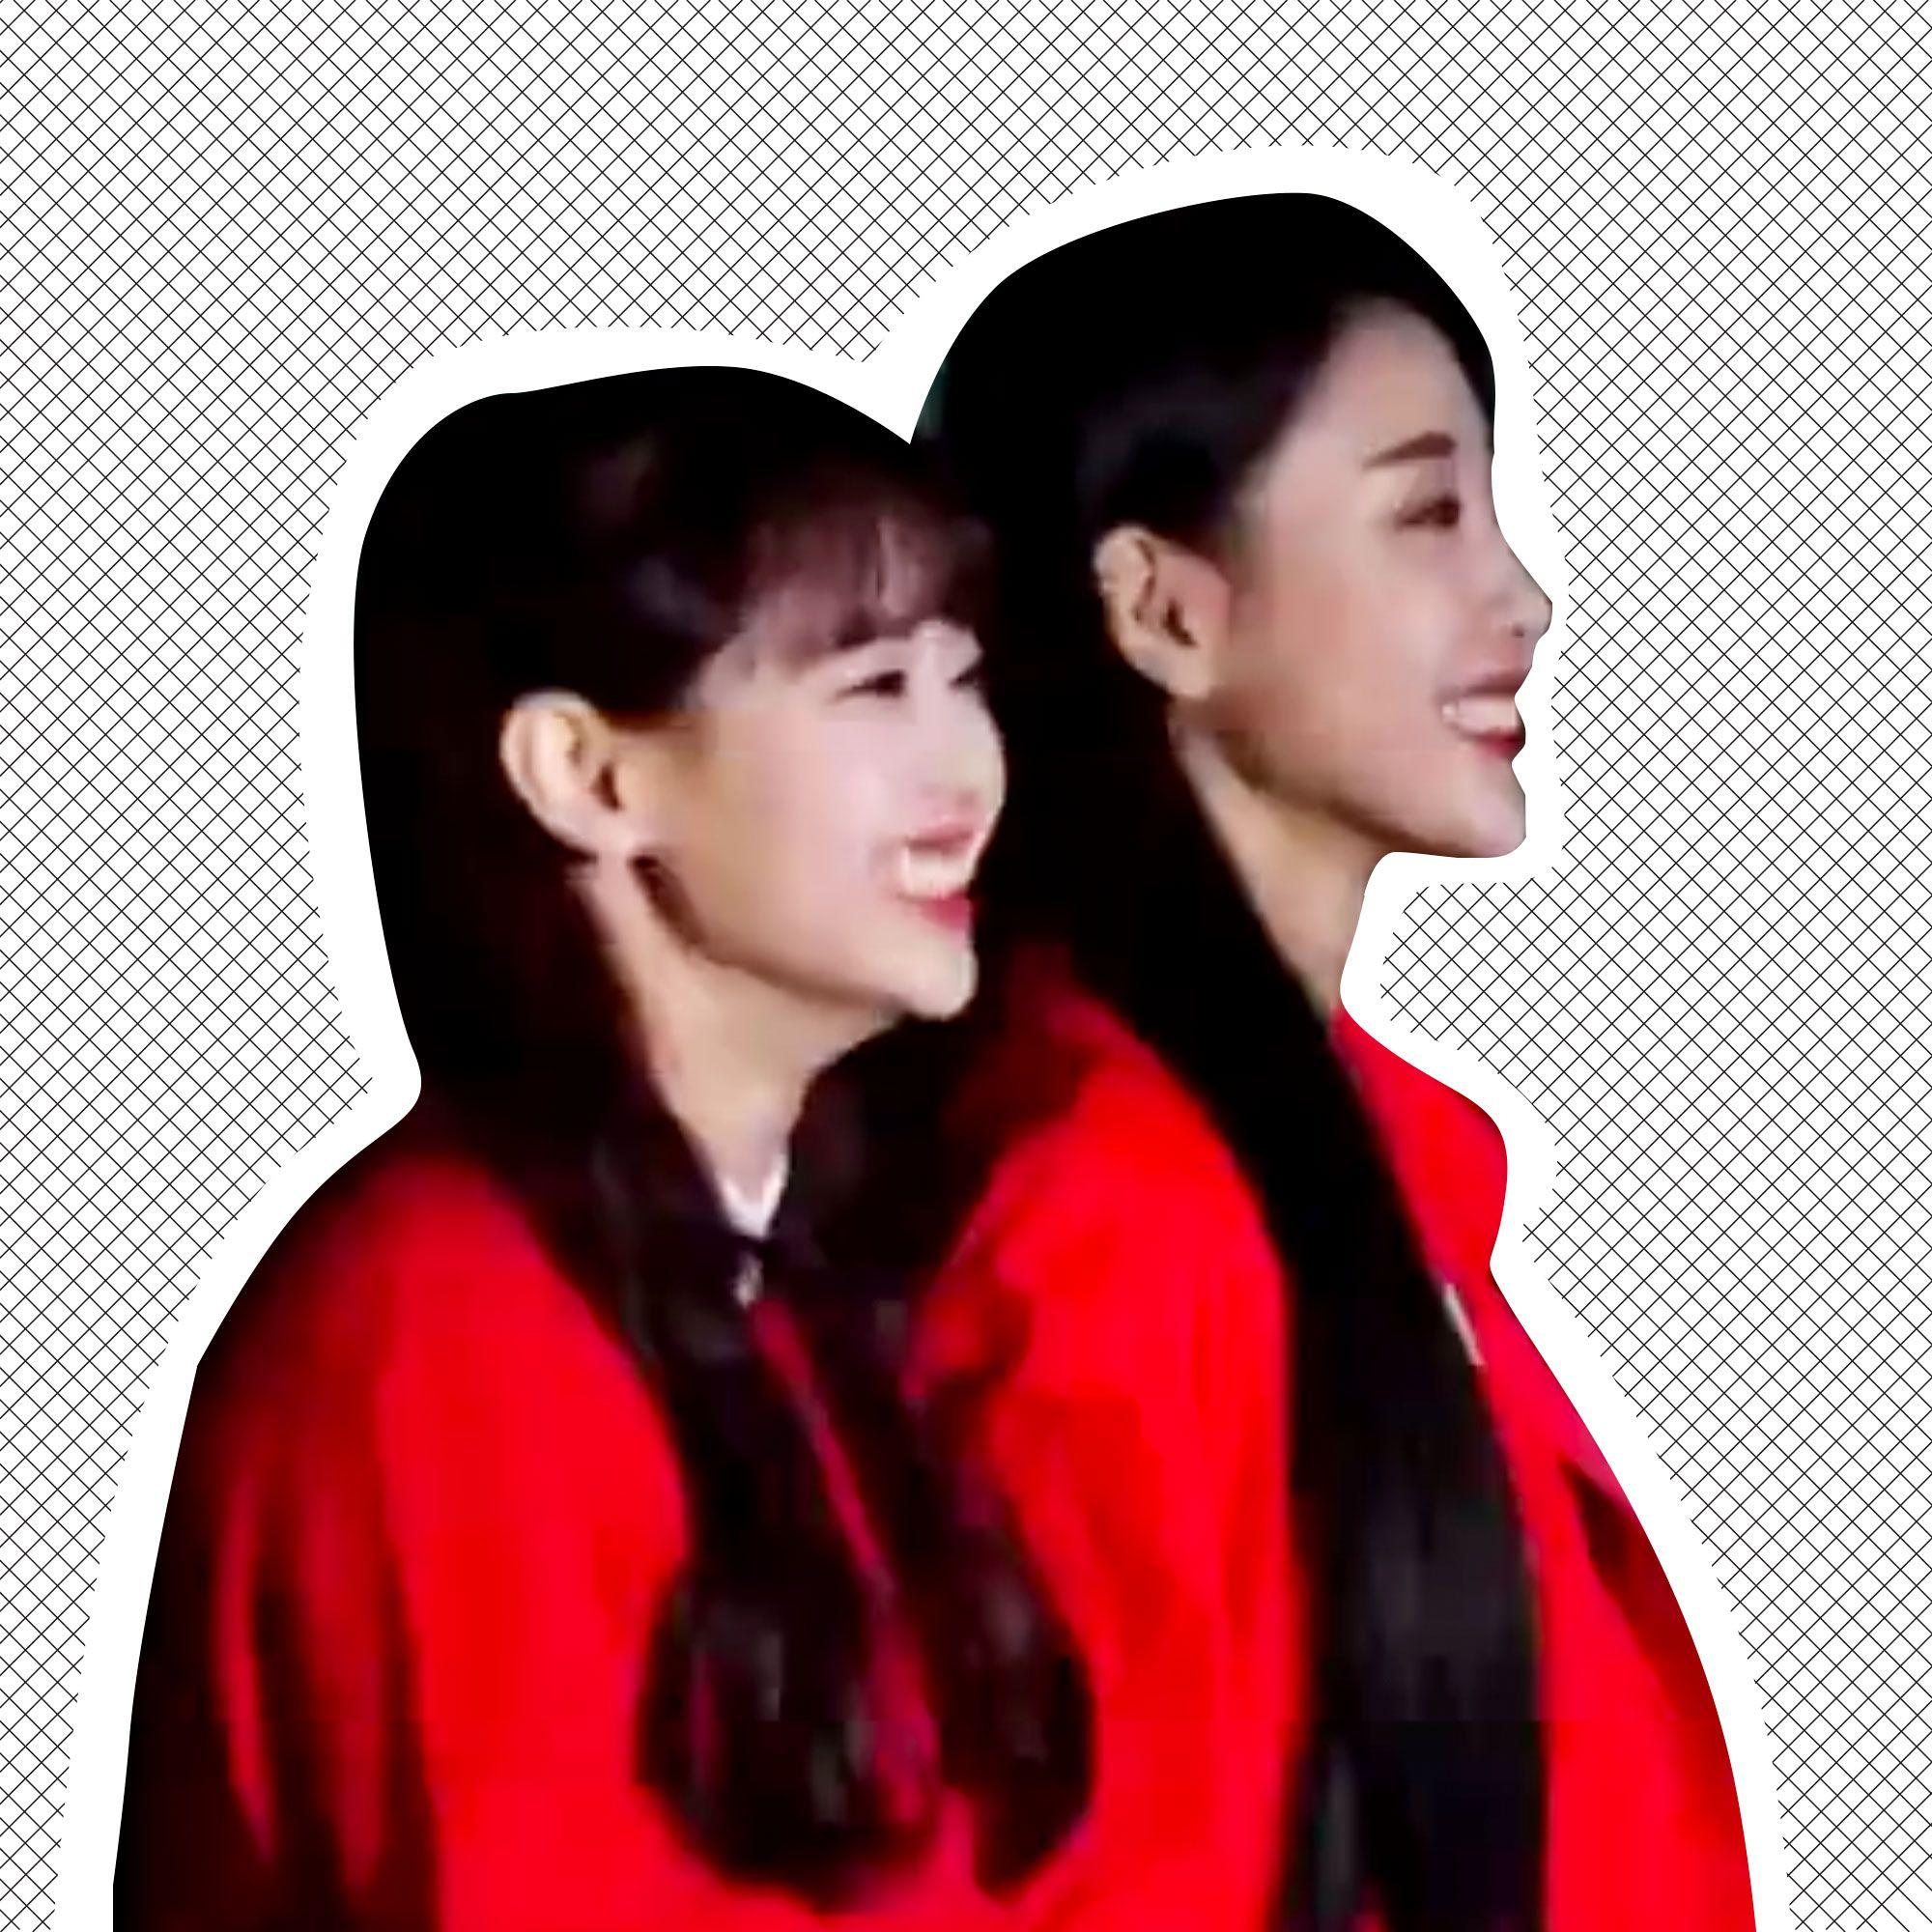 Internet Falls For Tweet About Lesbian Korean Billionaires